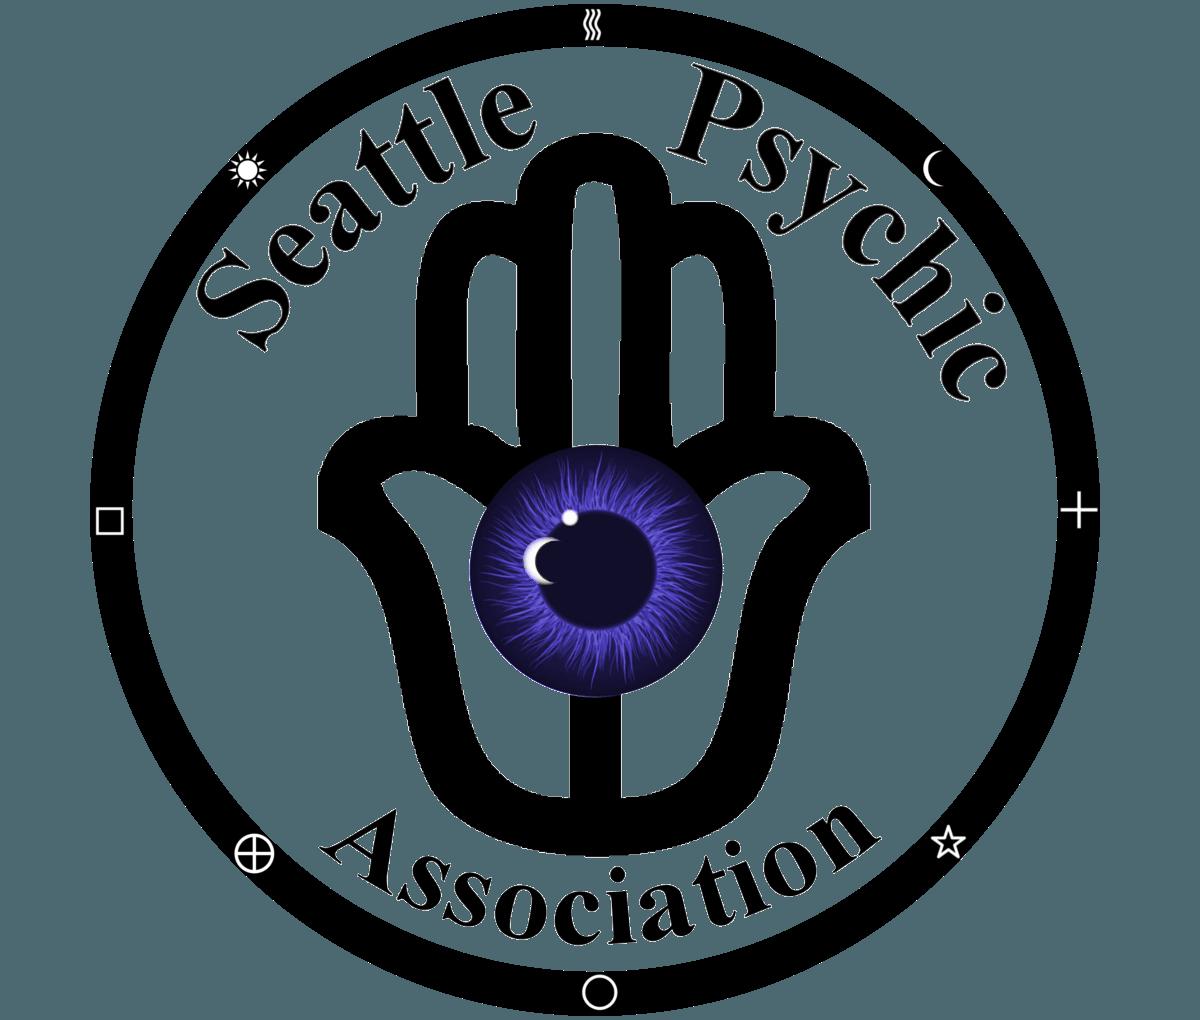 Seattle Psychic Association; https://www.seattlepsychicsassociation.com/